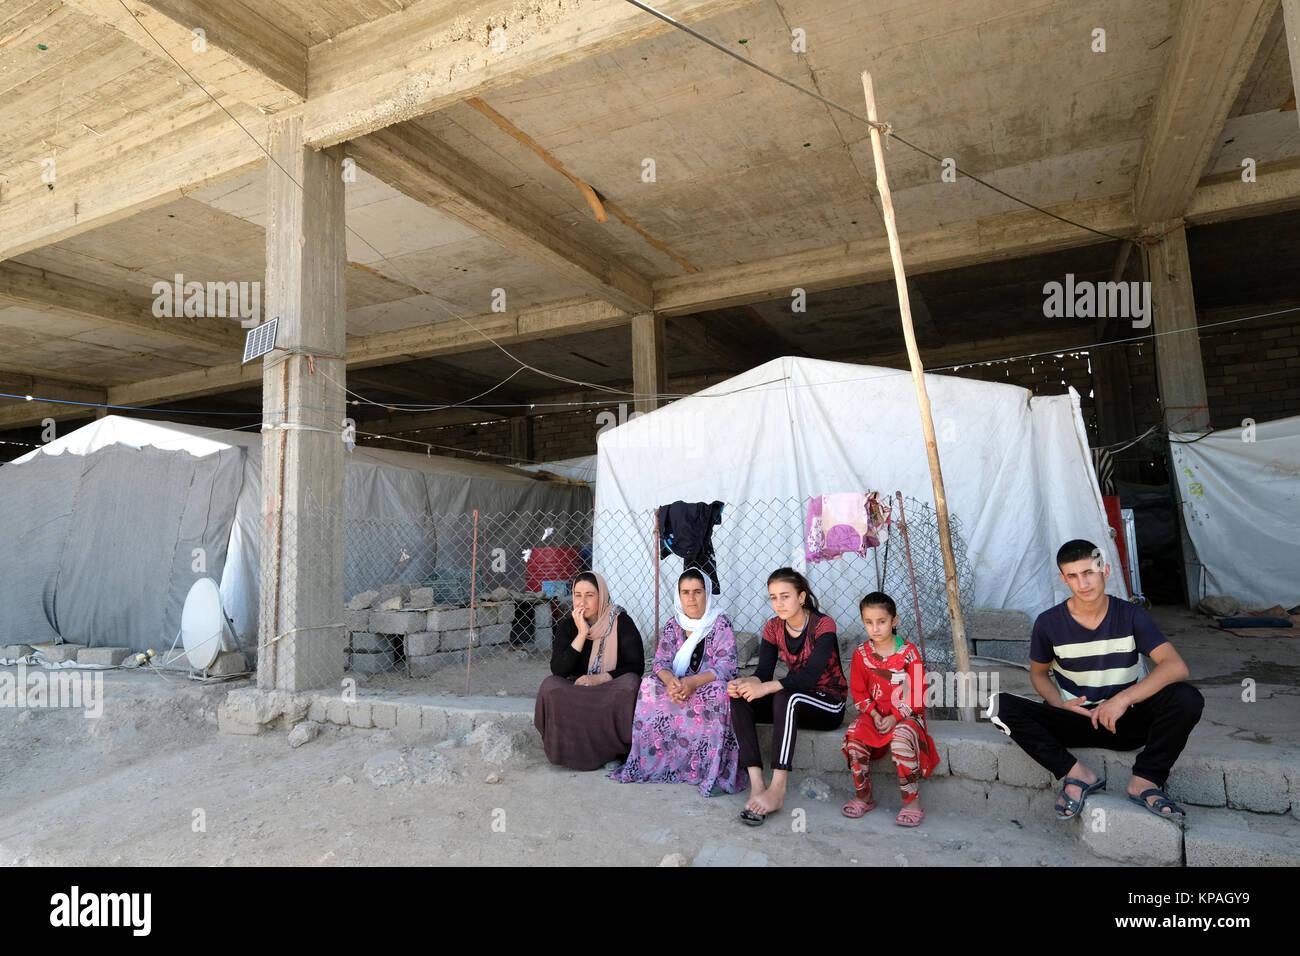 Kurdish Yezidi refugees live in a ruined building in Deraboun near the border with Iraq and Turkey, Kurdistan Autonomous - Stock Image